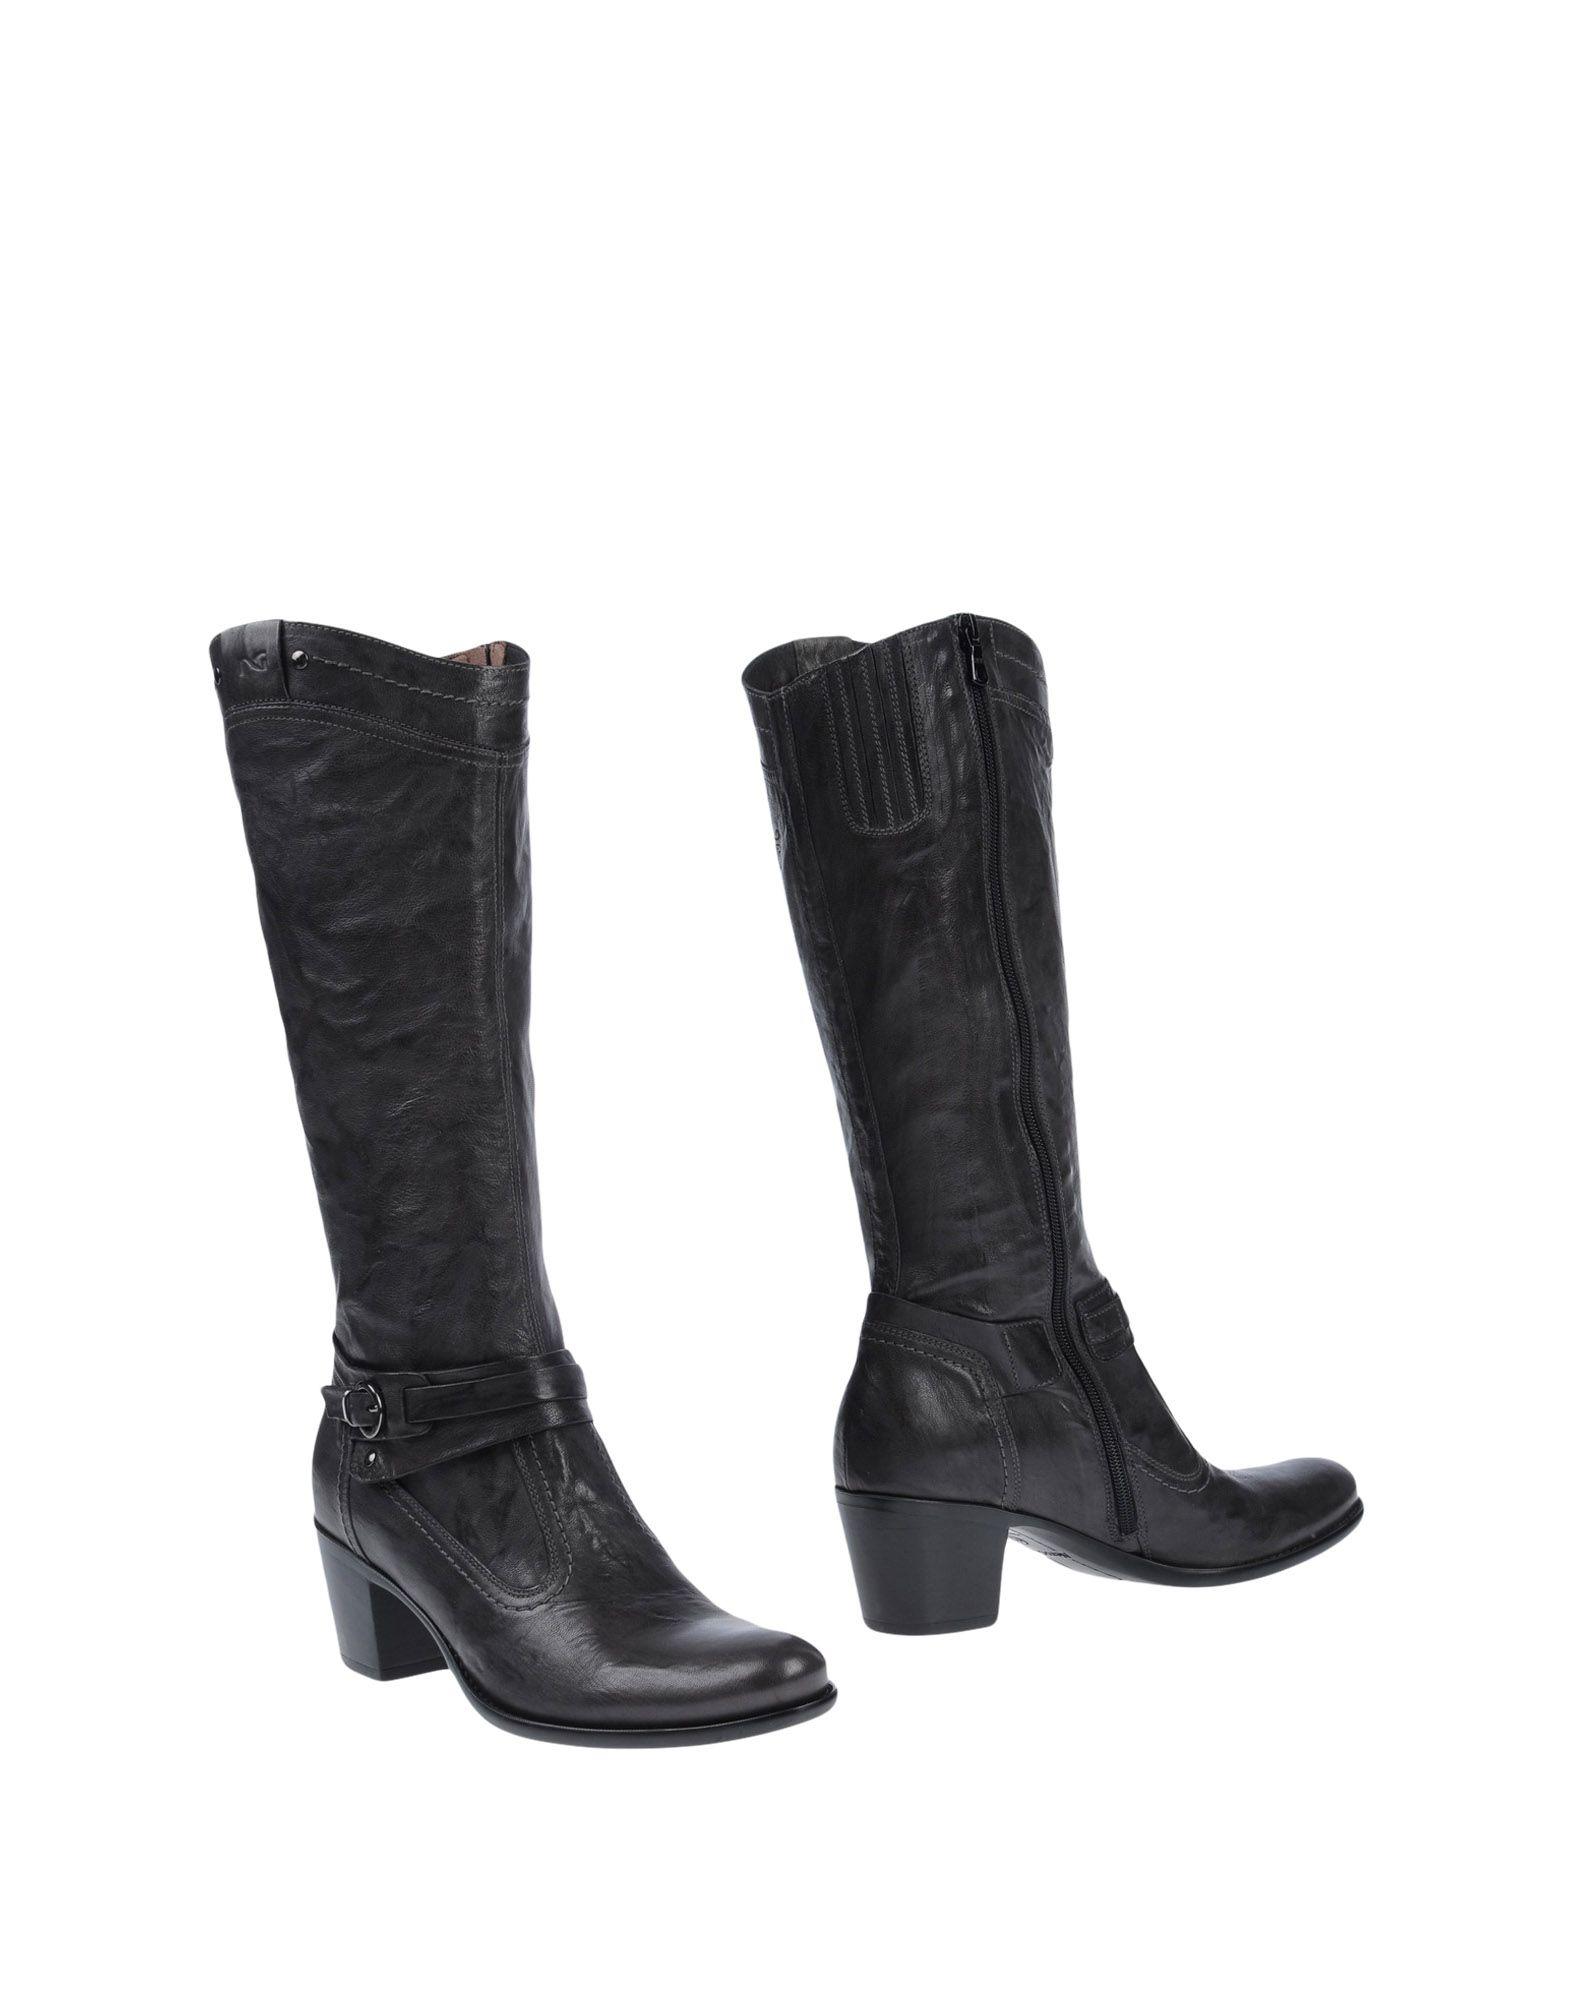 Gut um billige Damen Schuhe zu tragenNero Giardini Stiefel Damen billige  11506082PF 0a4de1